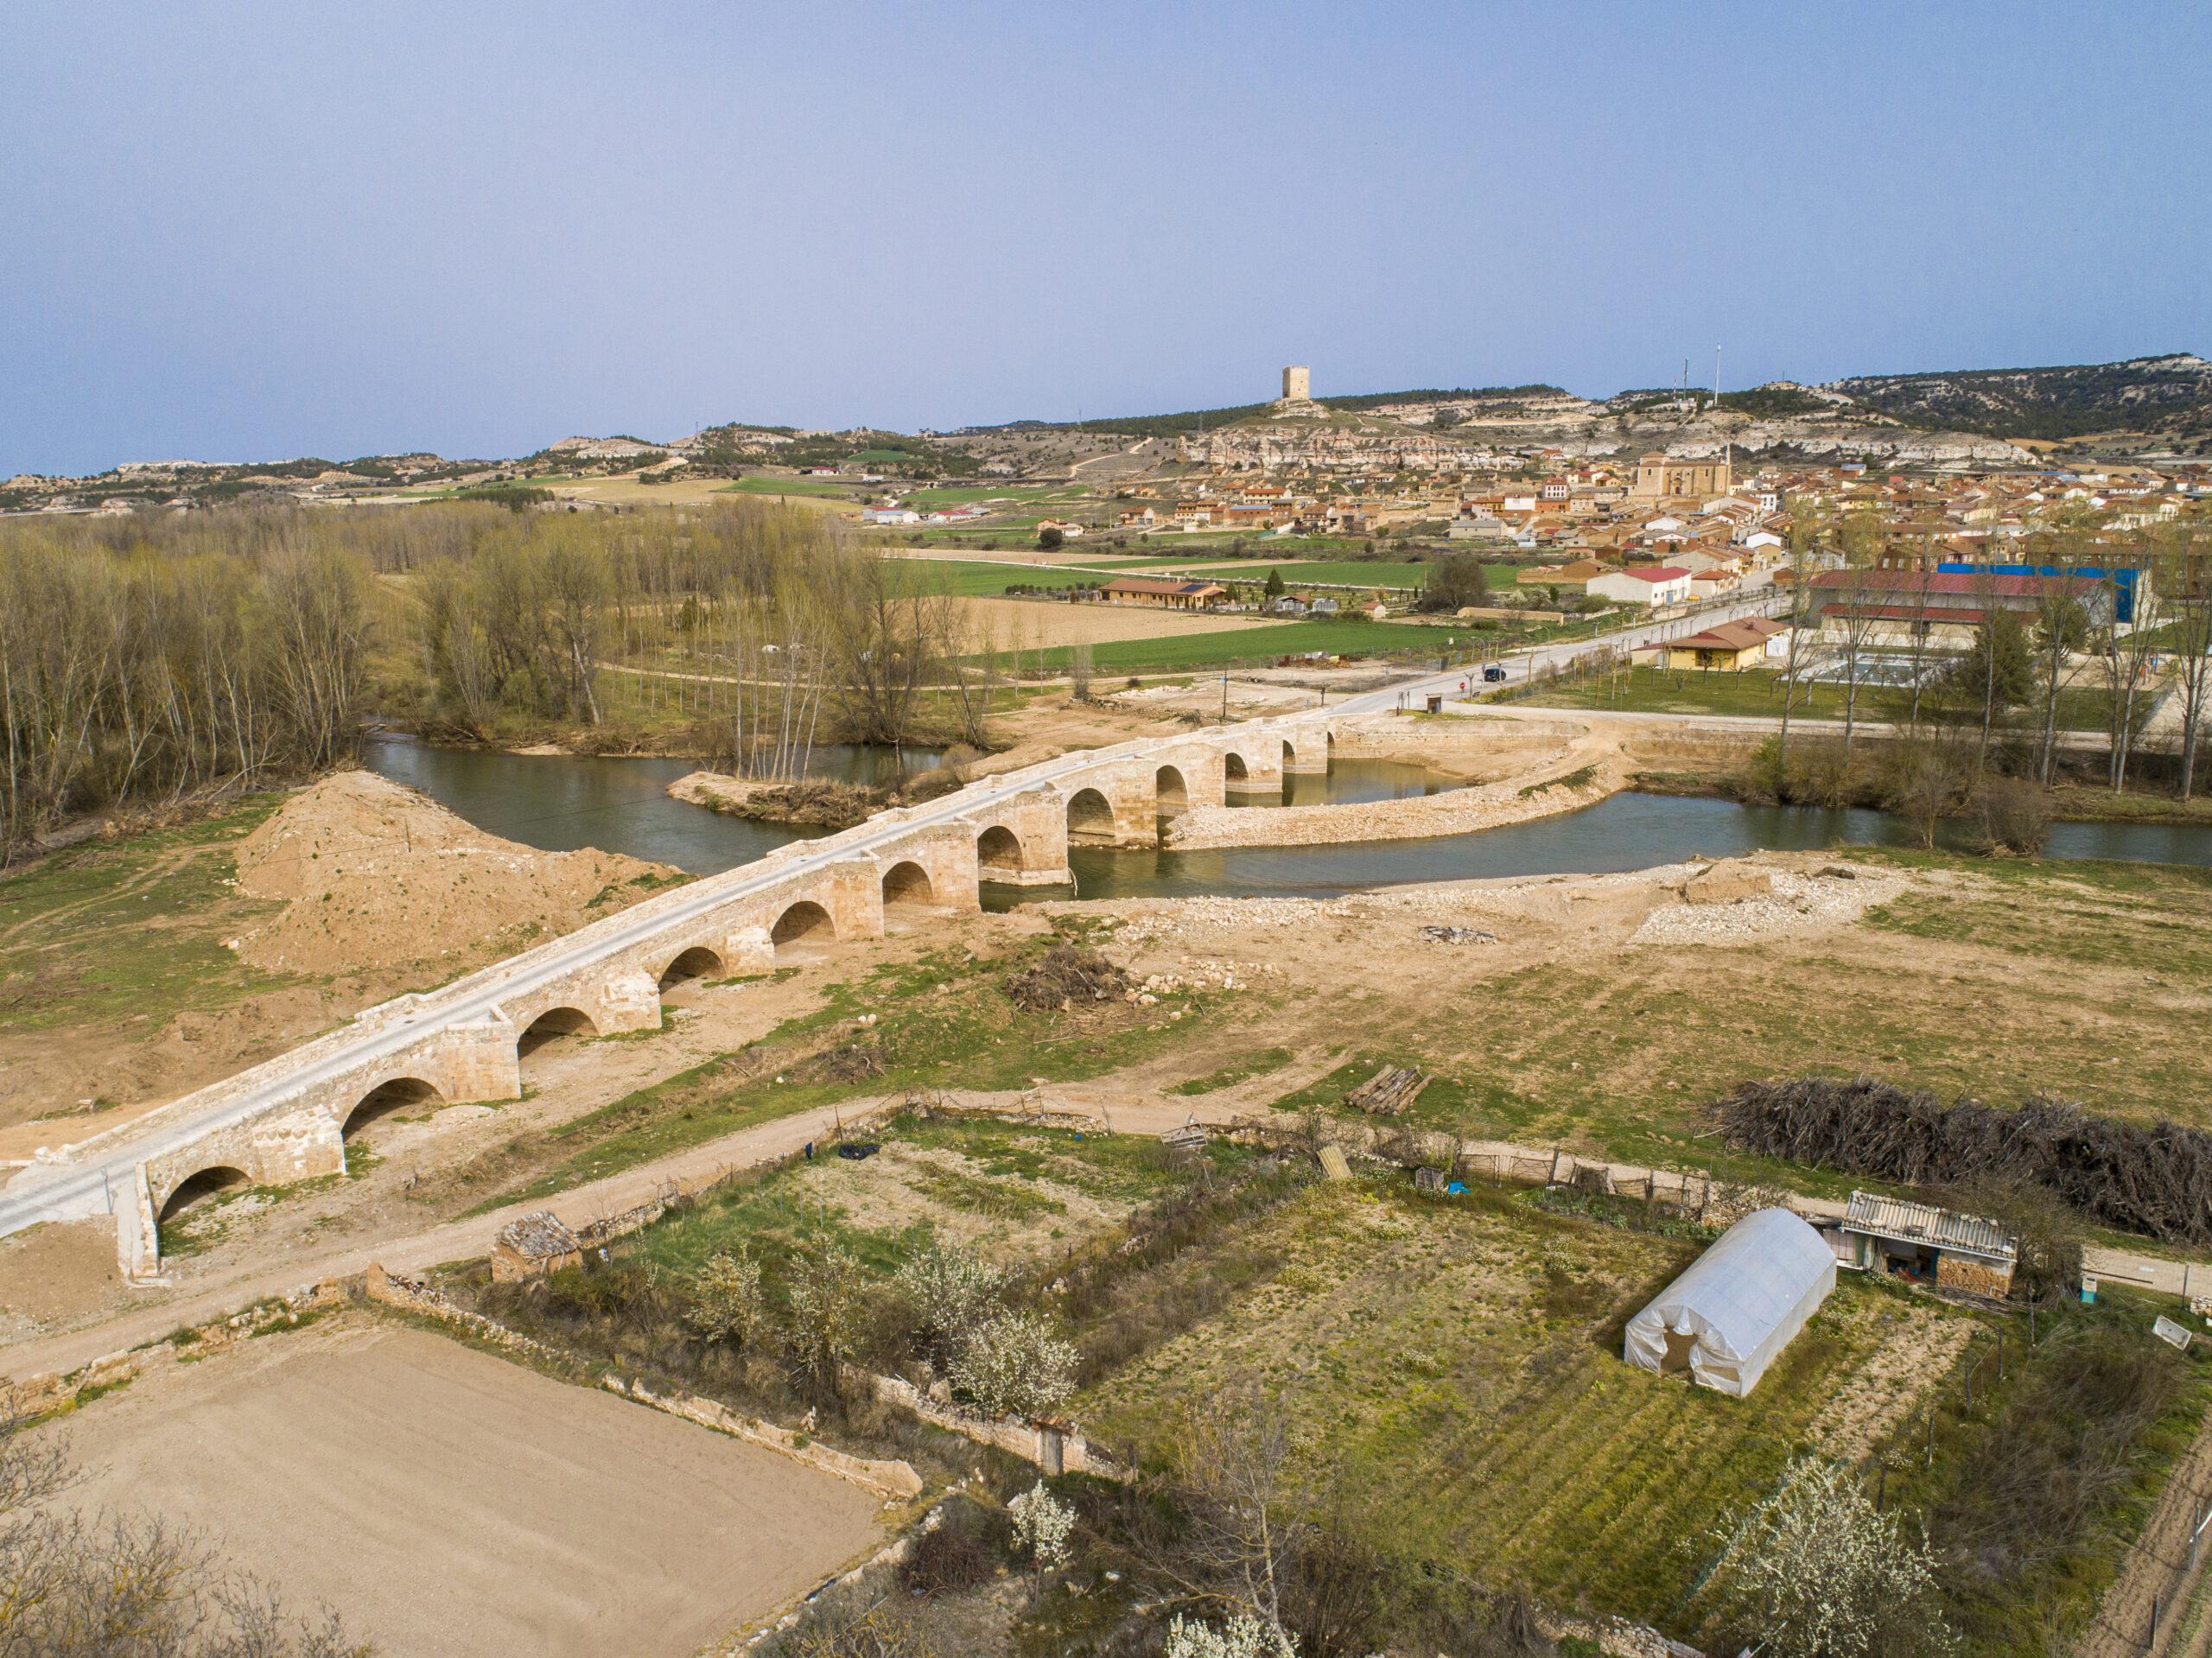 puente alpha drones dji phnatom langa duero